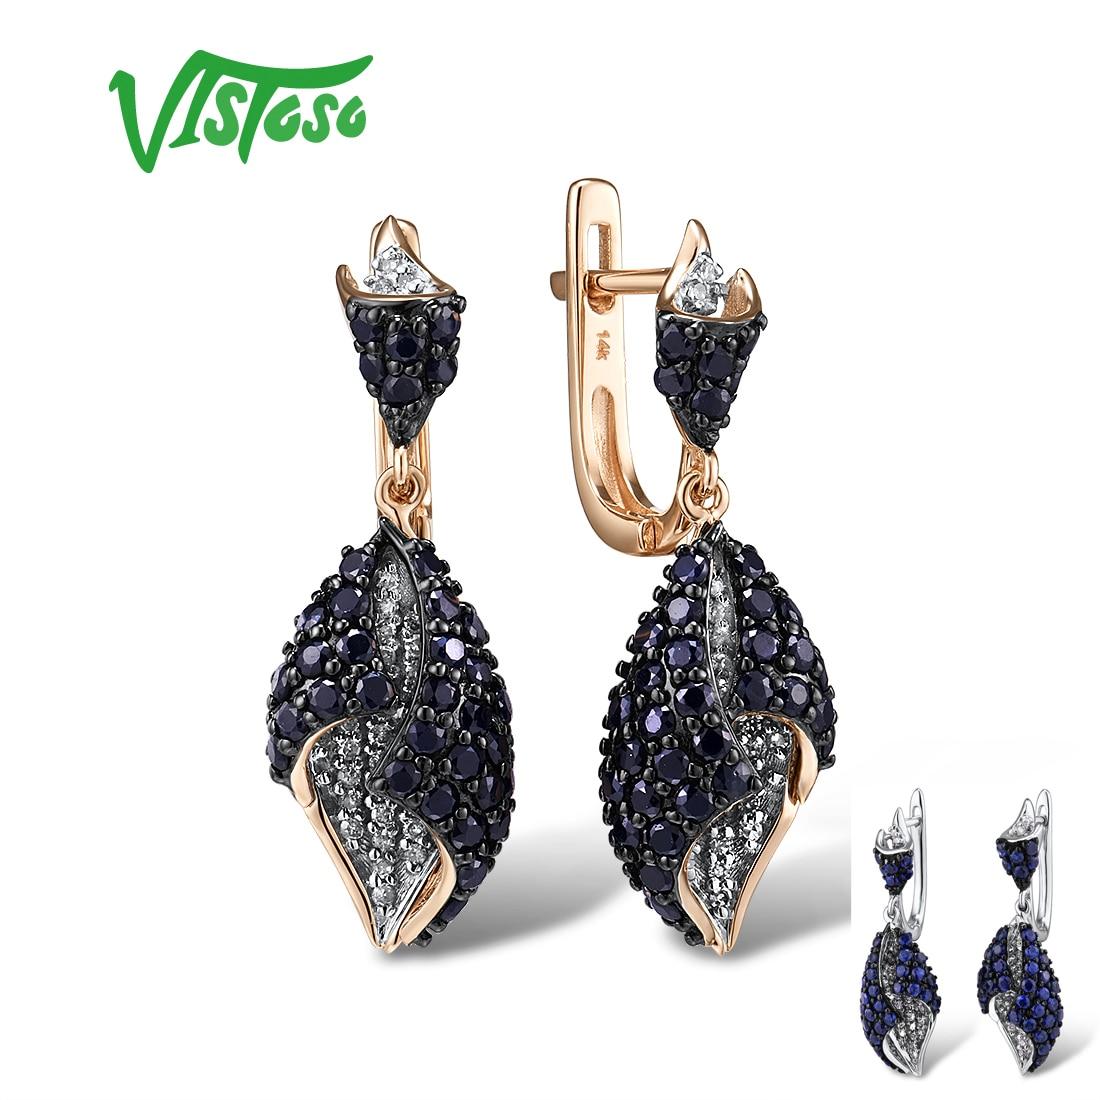 VISTOSO Gold Earrings For Women Genuine 14K 585 Rose White Gold Sparkling Diamond Blue Sapphire Drop Earrings Fine Jewelry